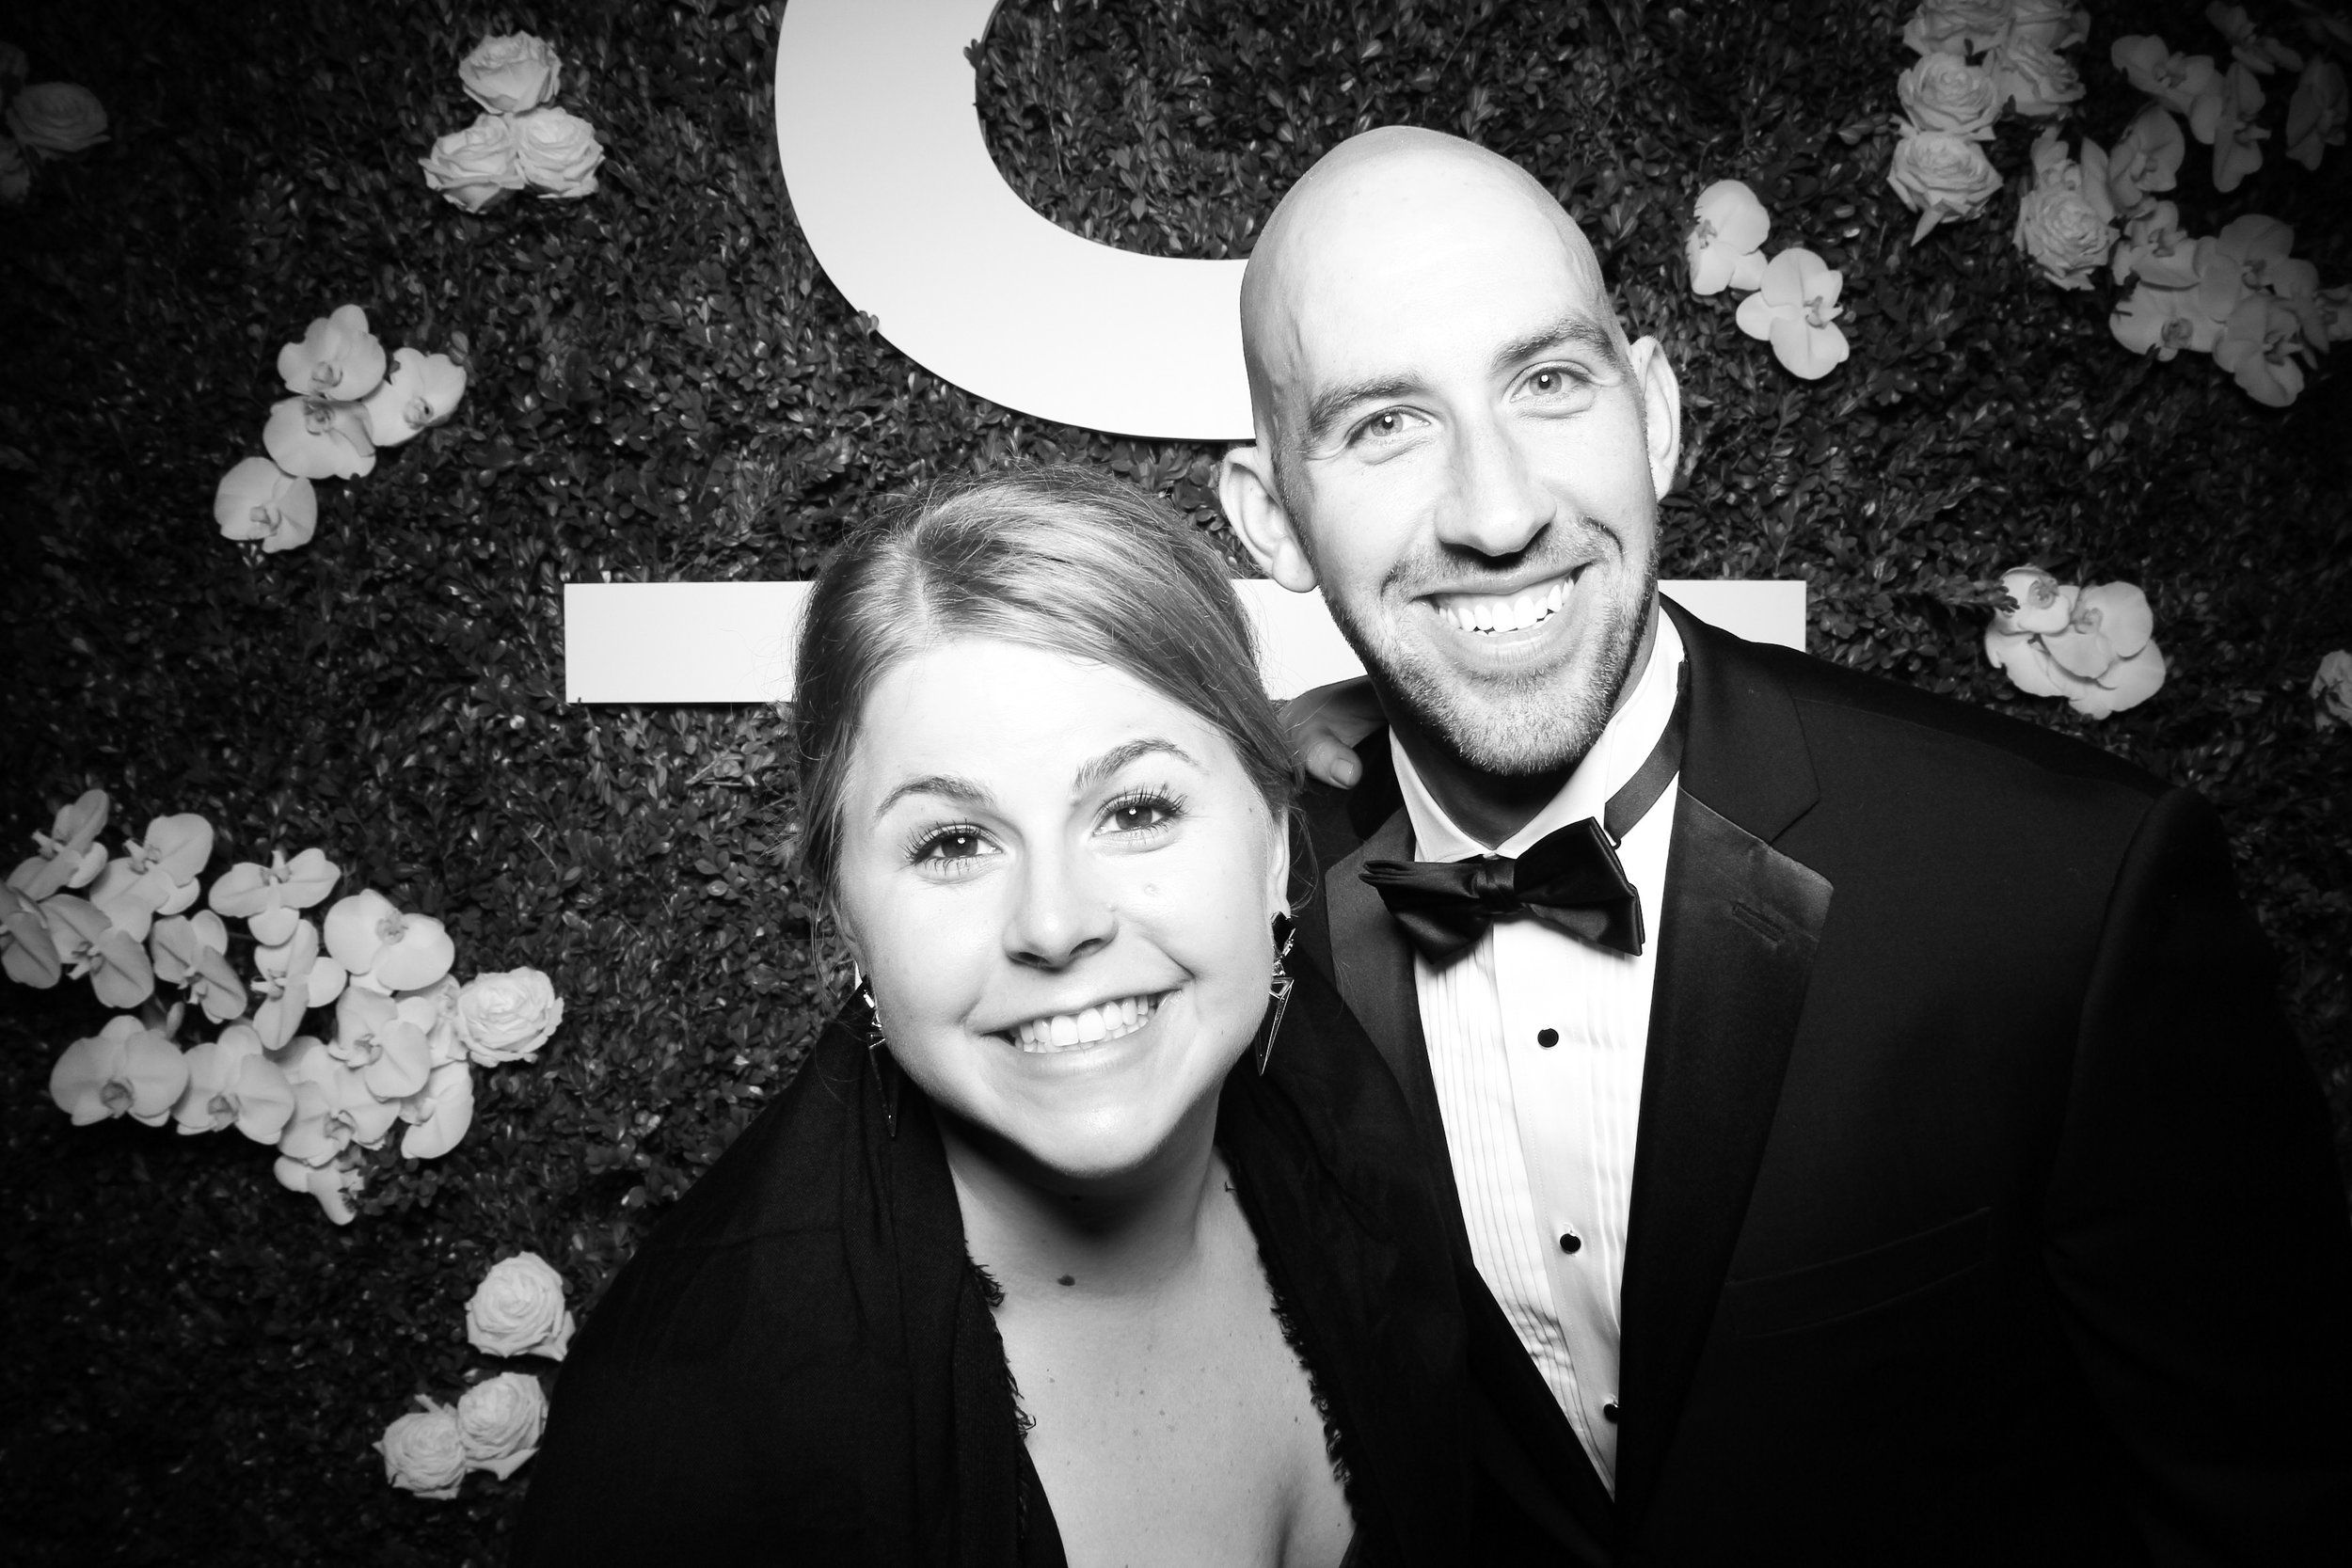 Peninsula_Hotel_Chicago_Wedding_Photo_Booth_02.jpg